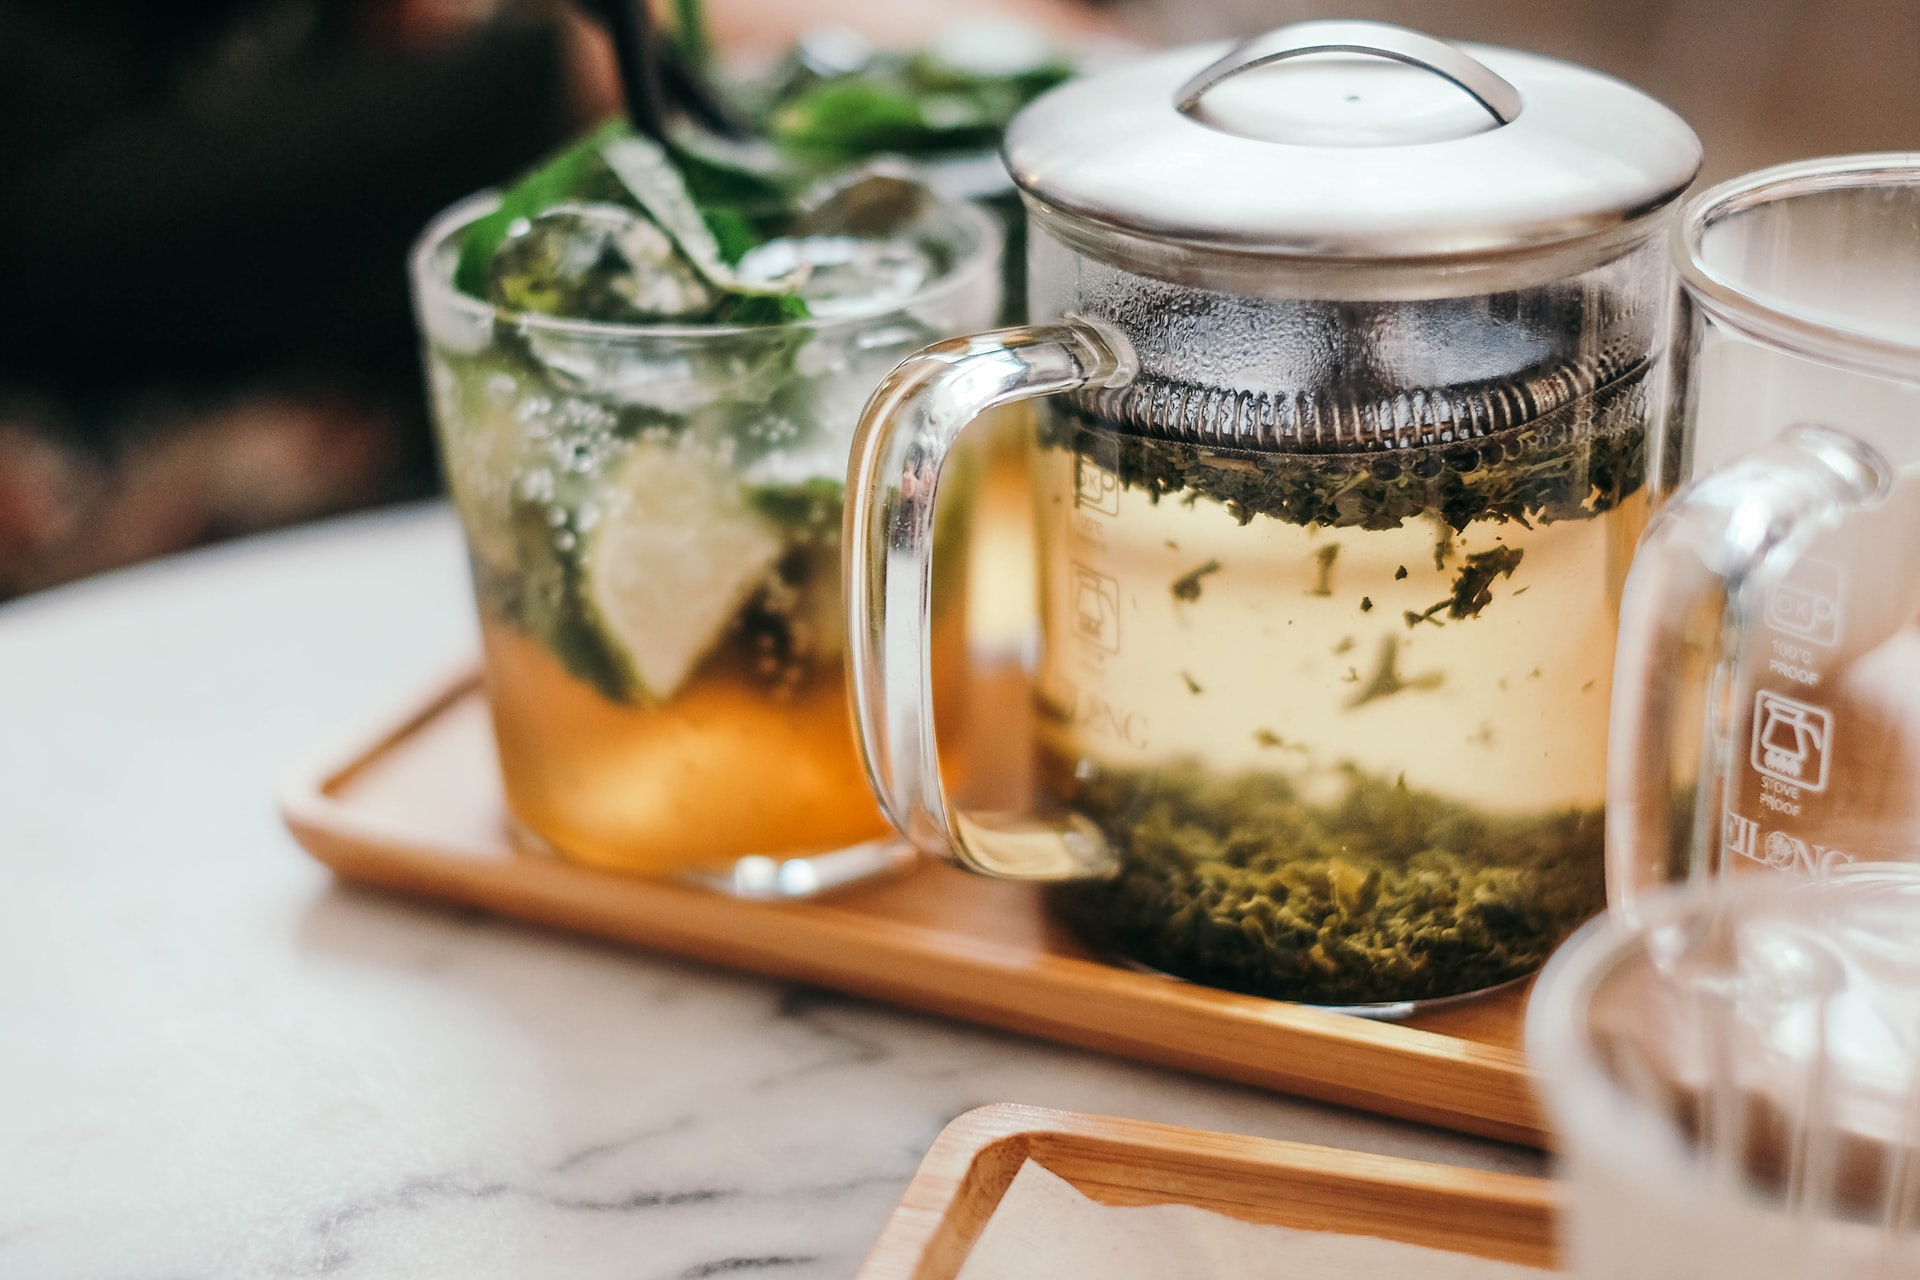 gingko tea strainer